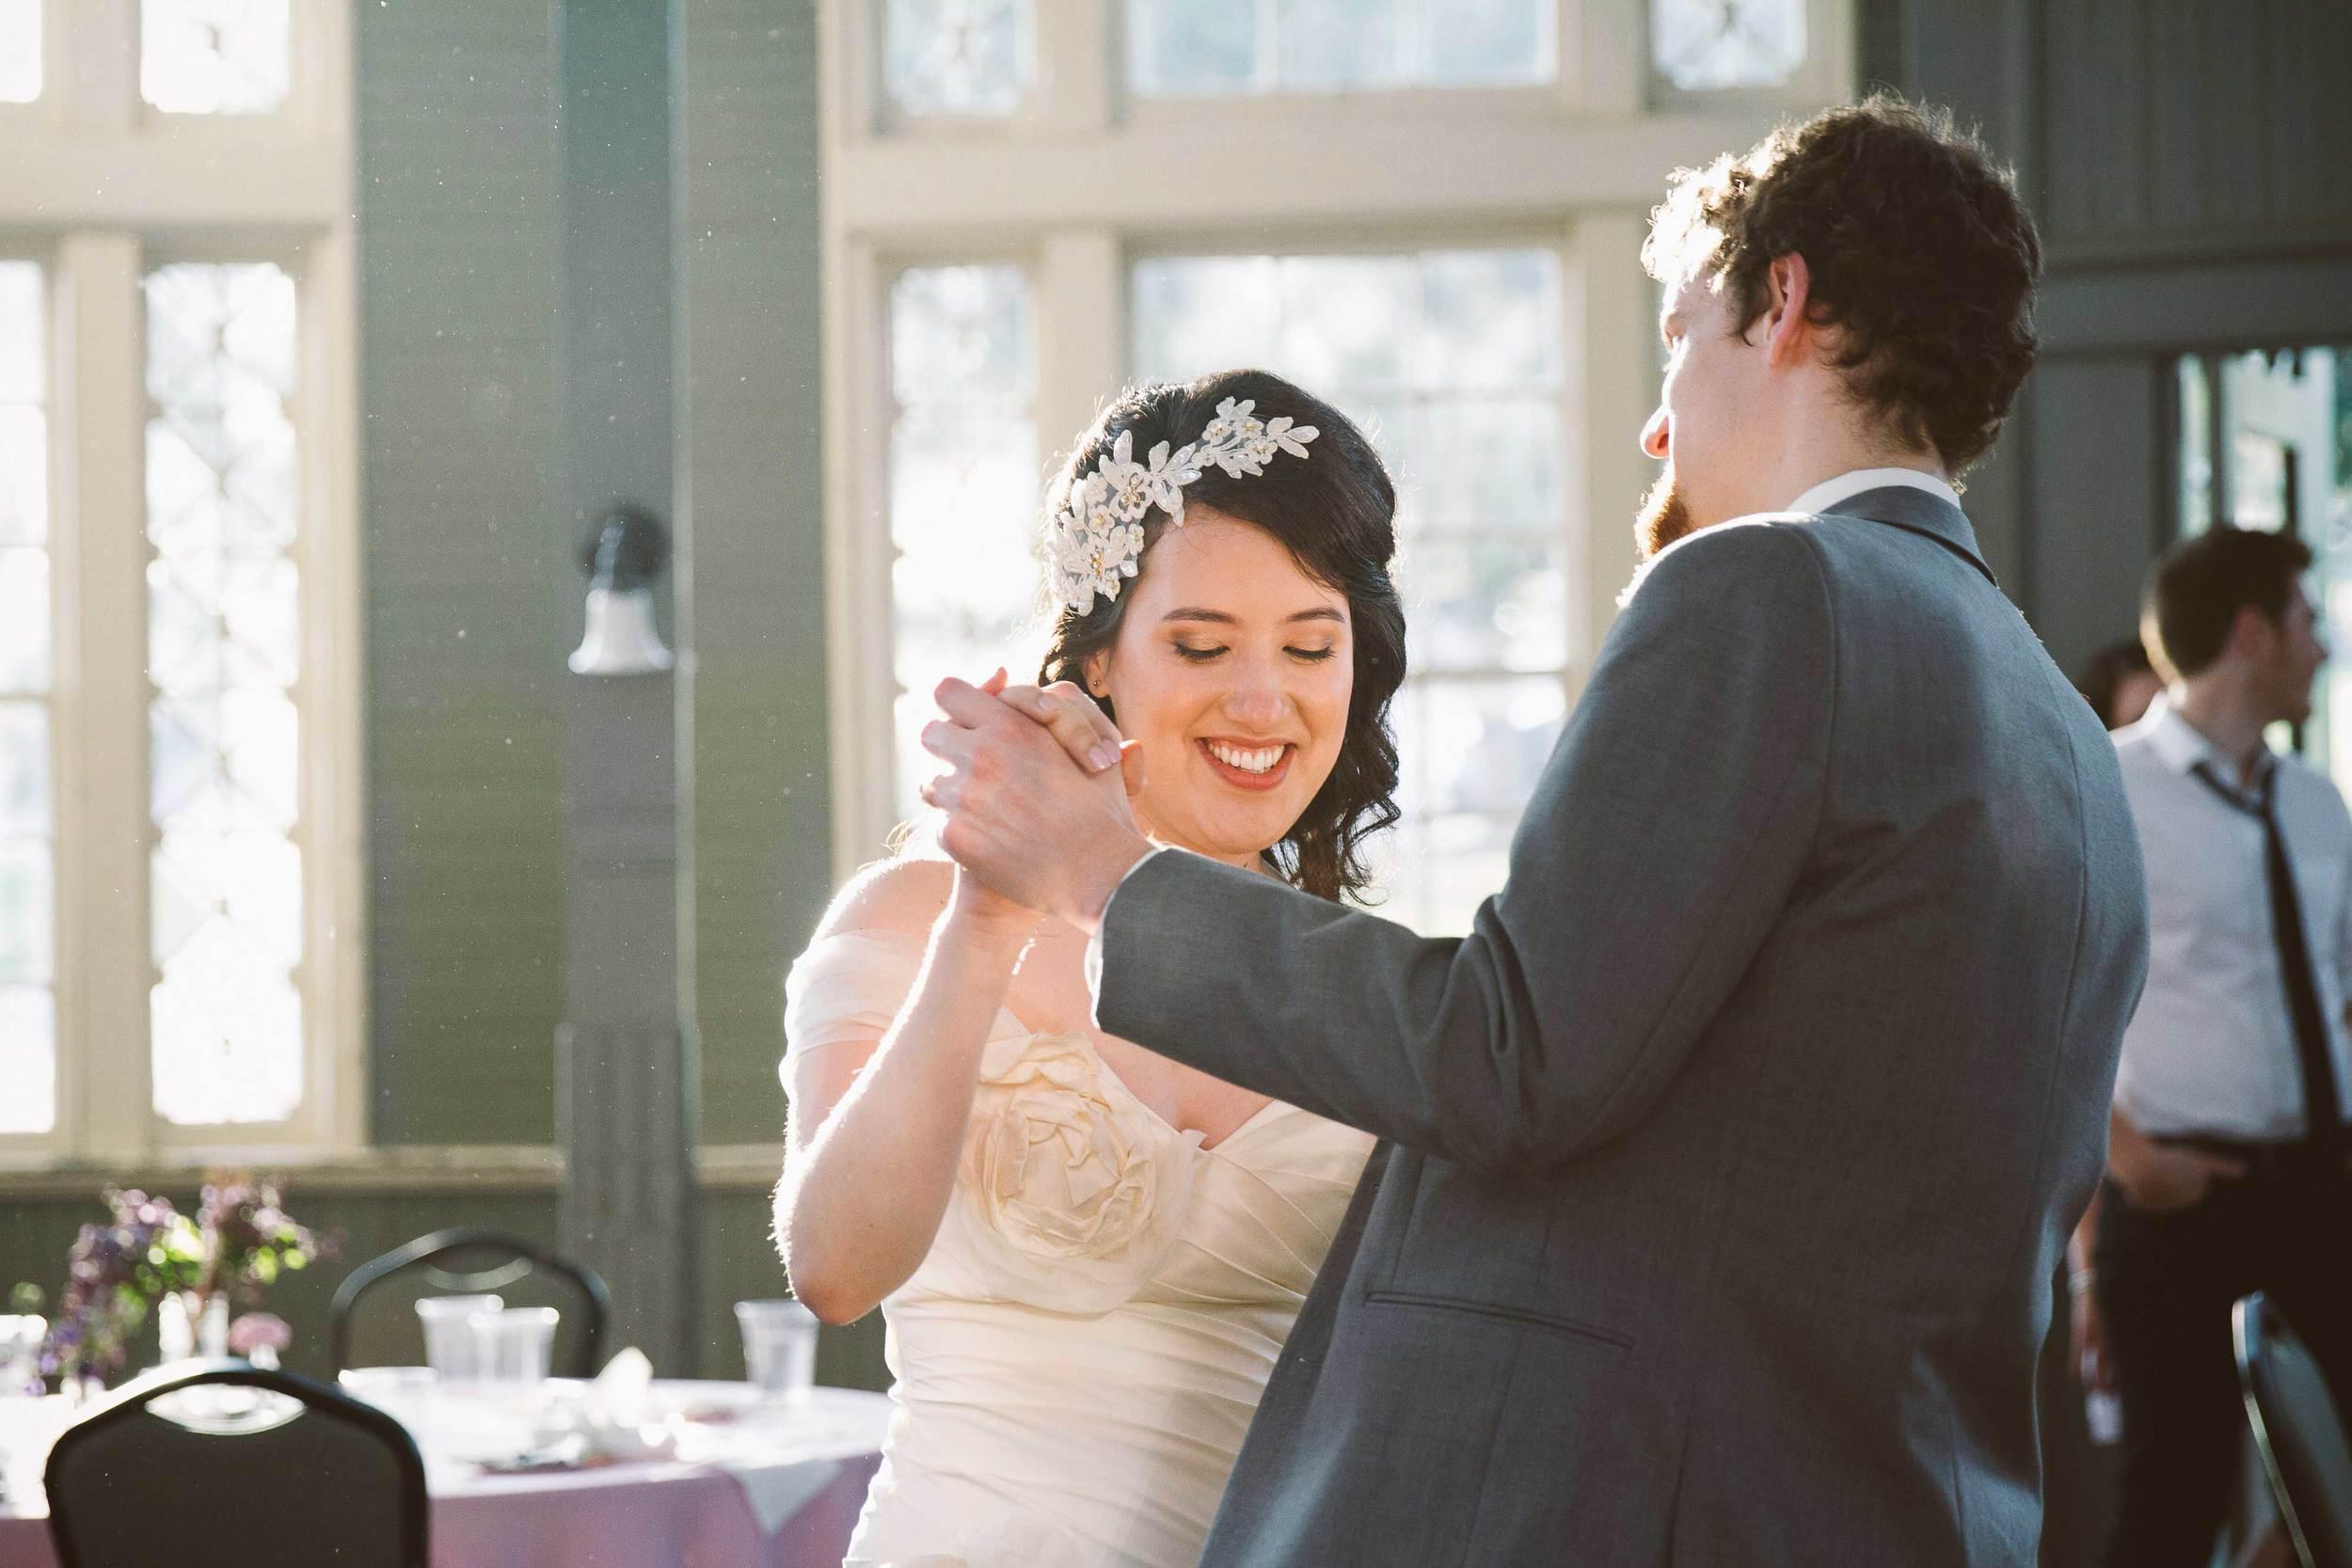 Radka-Wedding-Radka-April-18-2015-0461.jpg